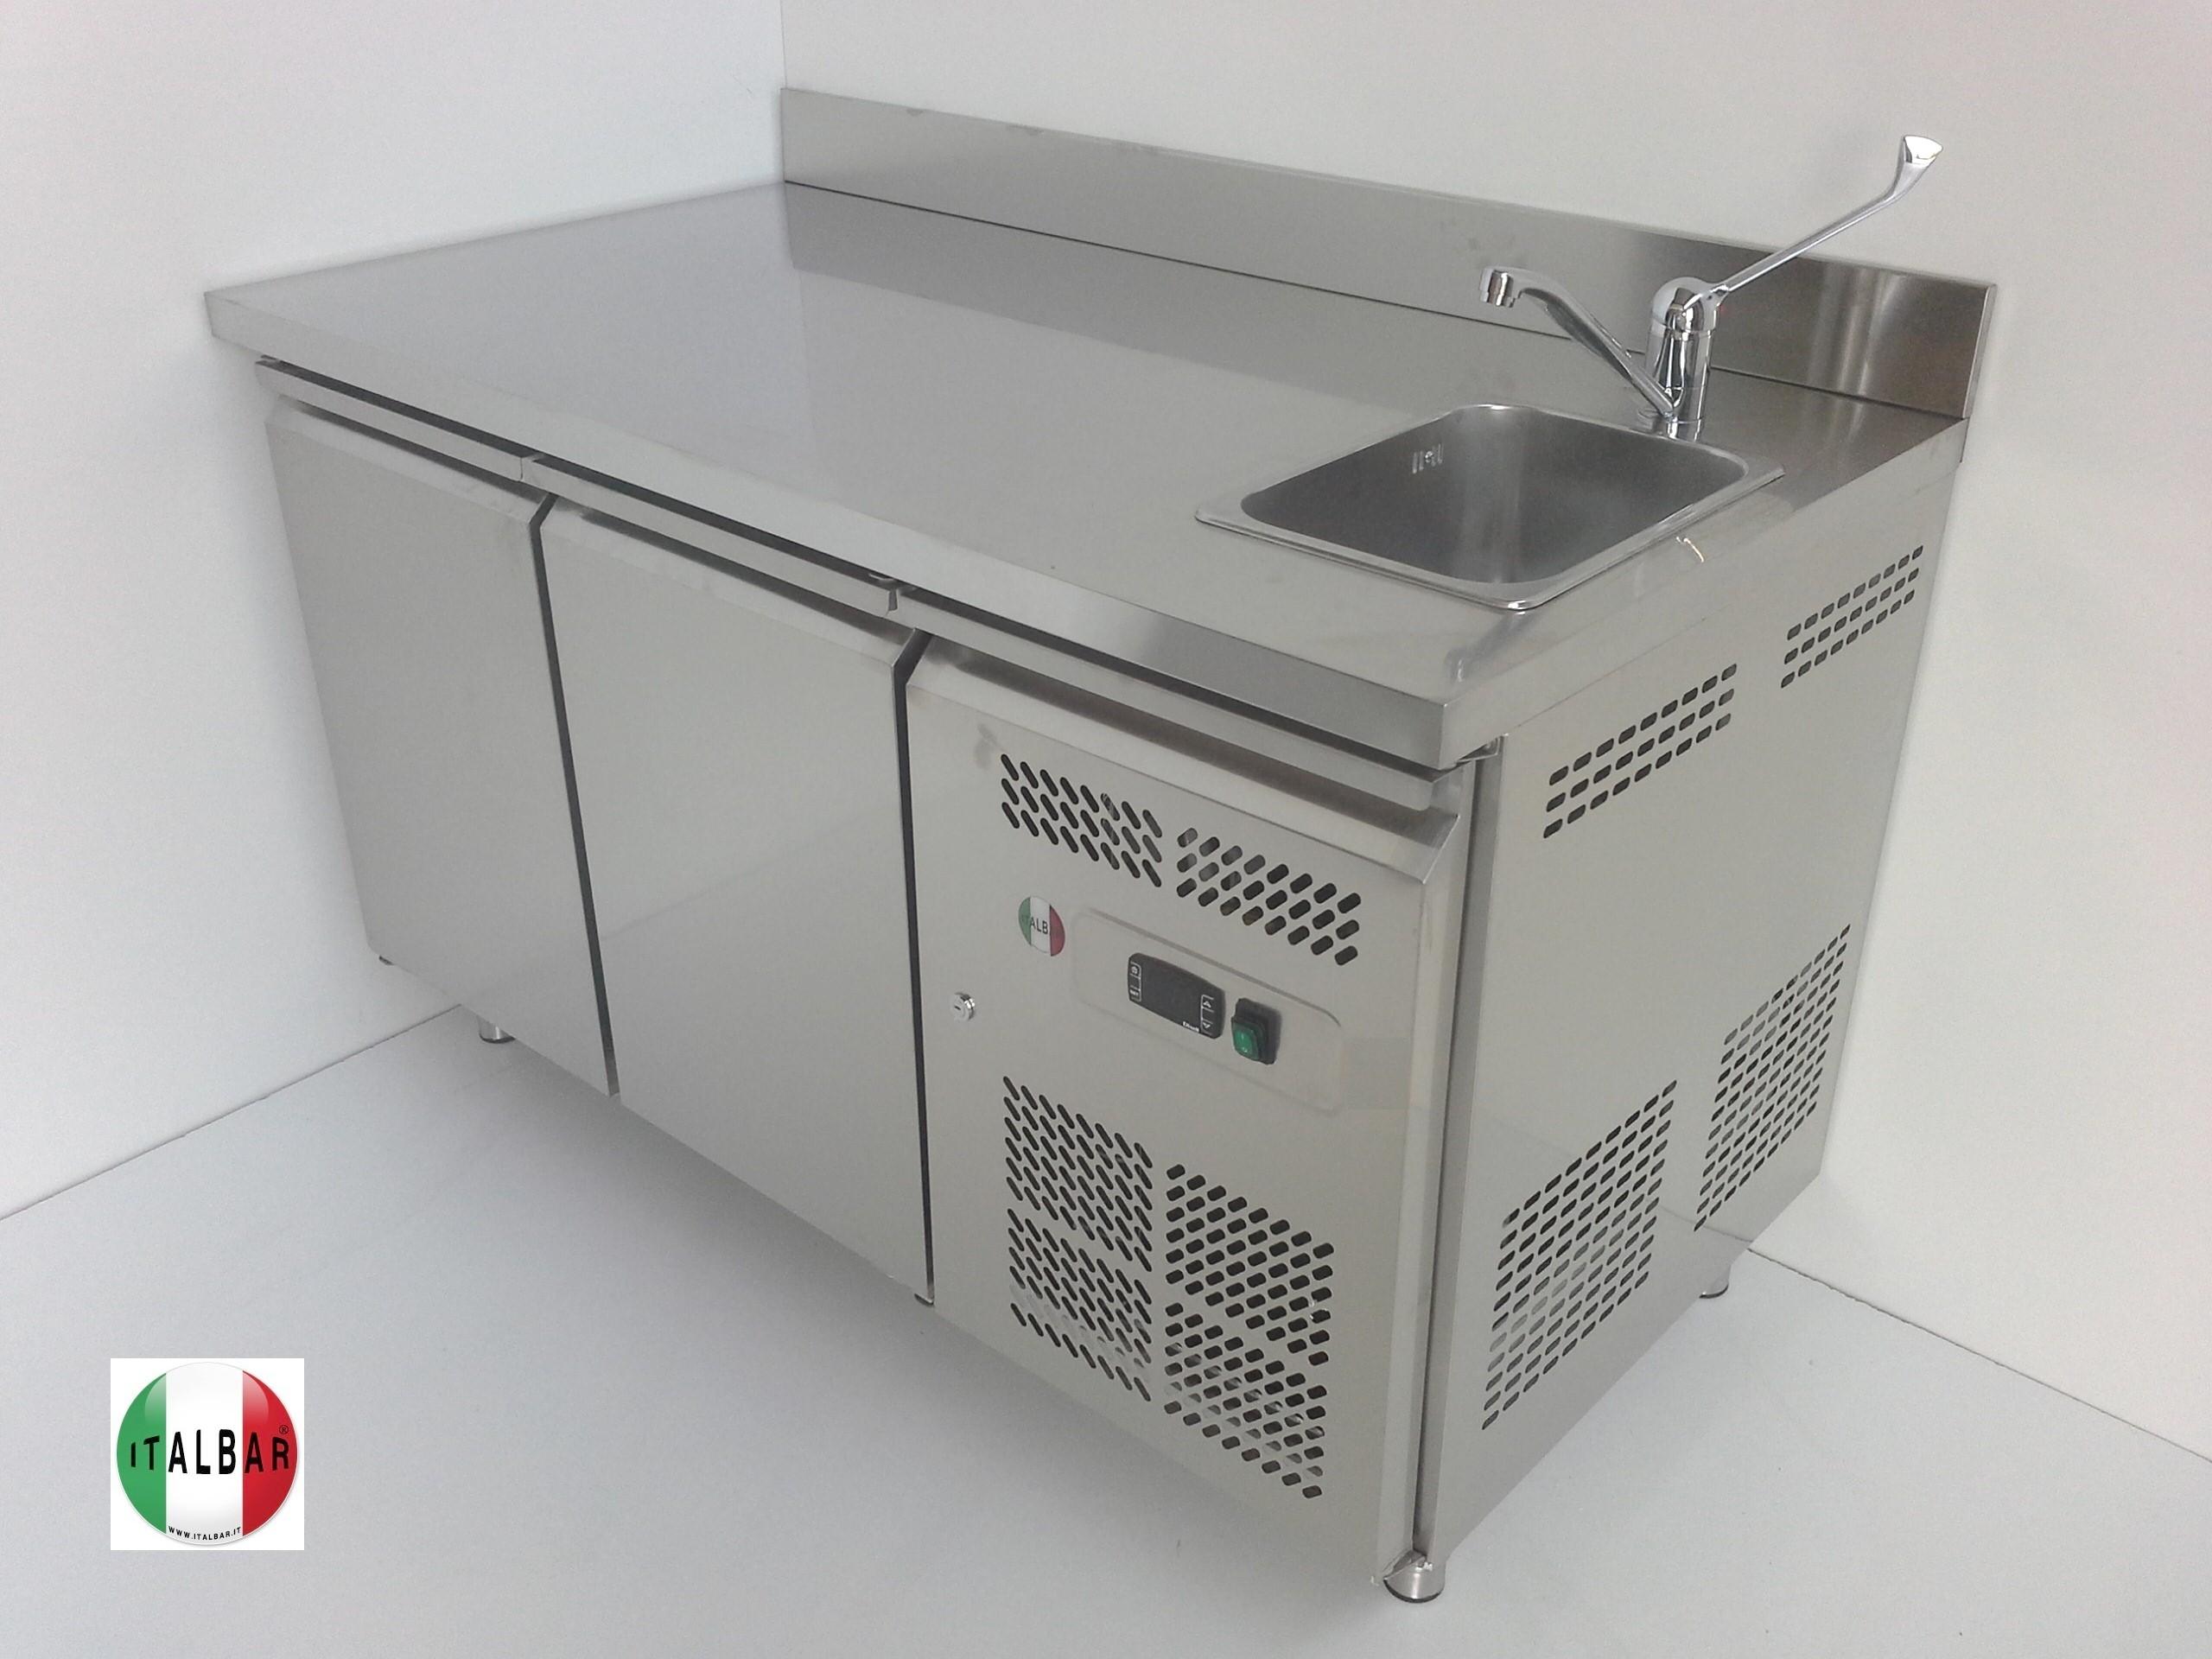 Italbar banconi bar banchi frigo vetrine refrigerate for Frigo 90 cm